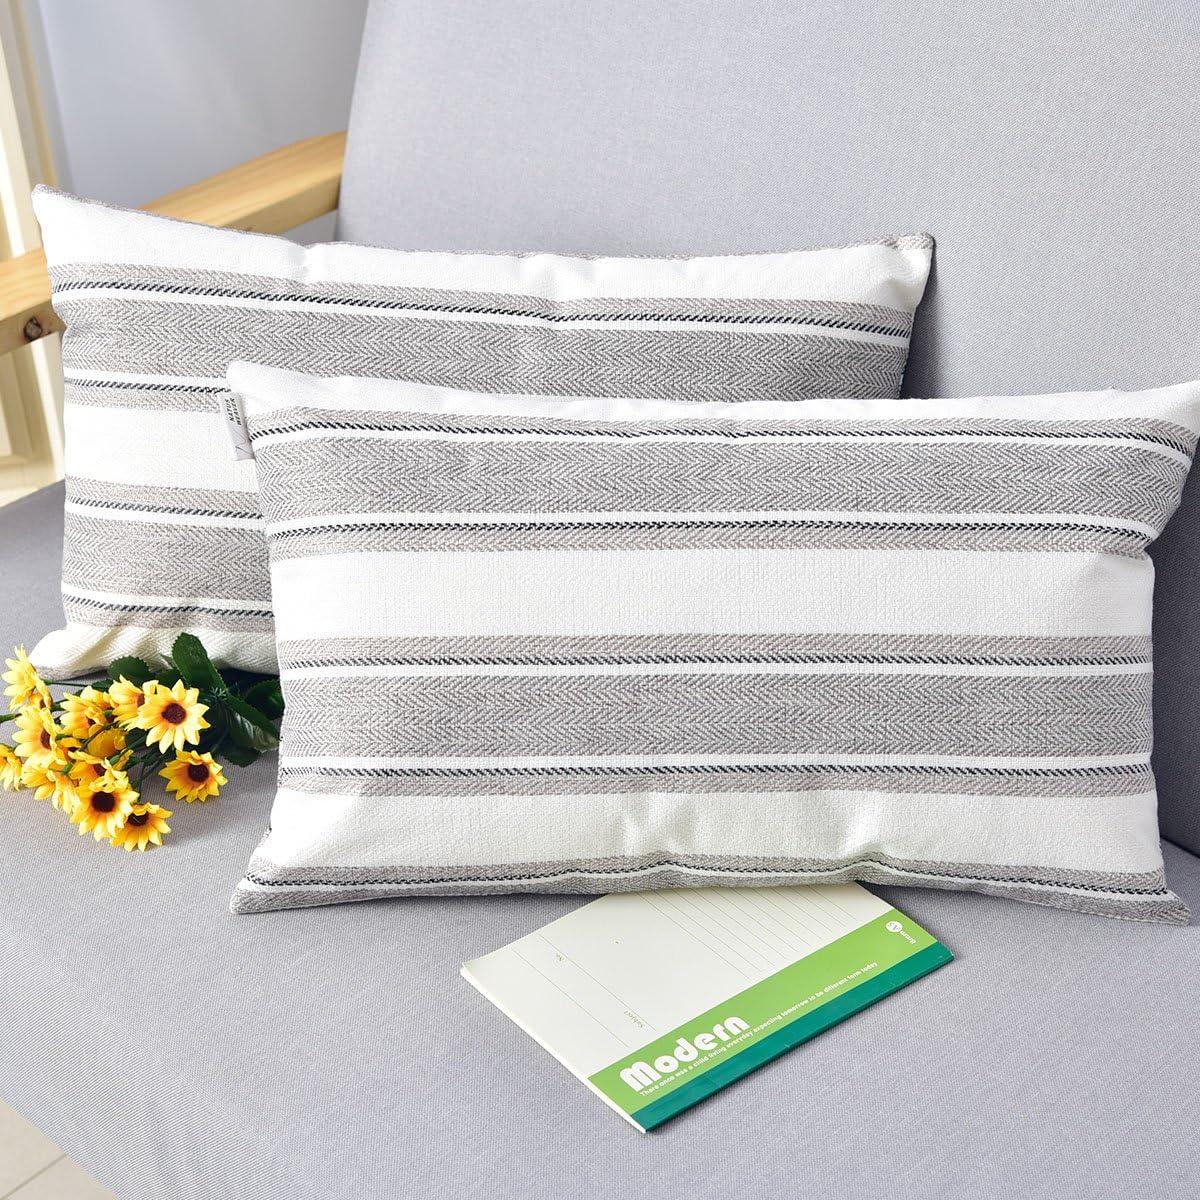 "NATUS WEAVER 2 Pieces Multi Color Stripe Pillow Cases Soft Linen Square Decorative Throw Cushion Cover Pillowcase with Hidden Zipper for Sofa - 12"" x 20"""